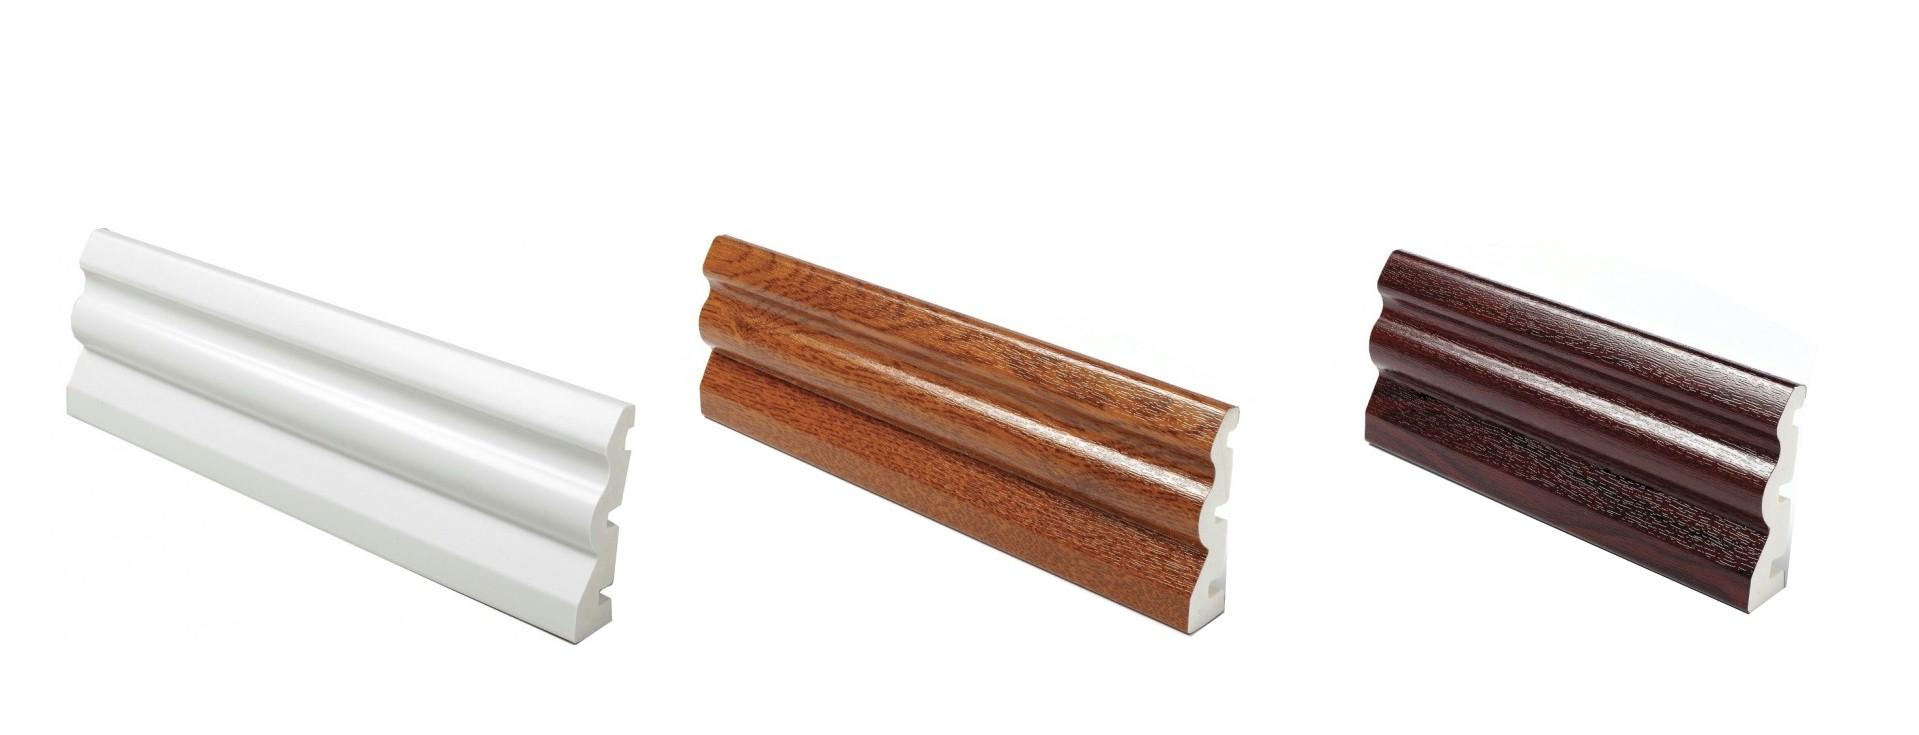 Suppliers Of Upvc Architrave Amp Skirting Master Plastics